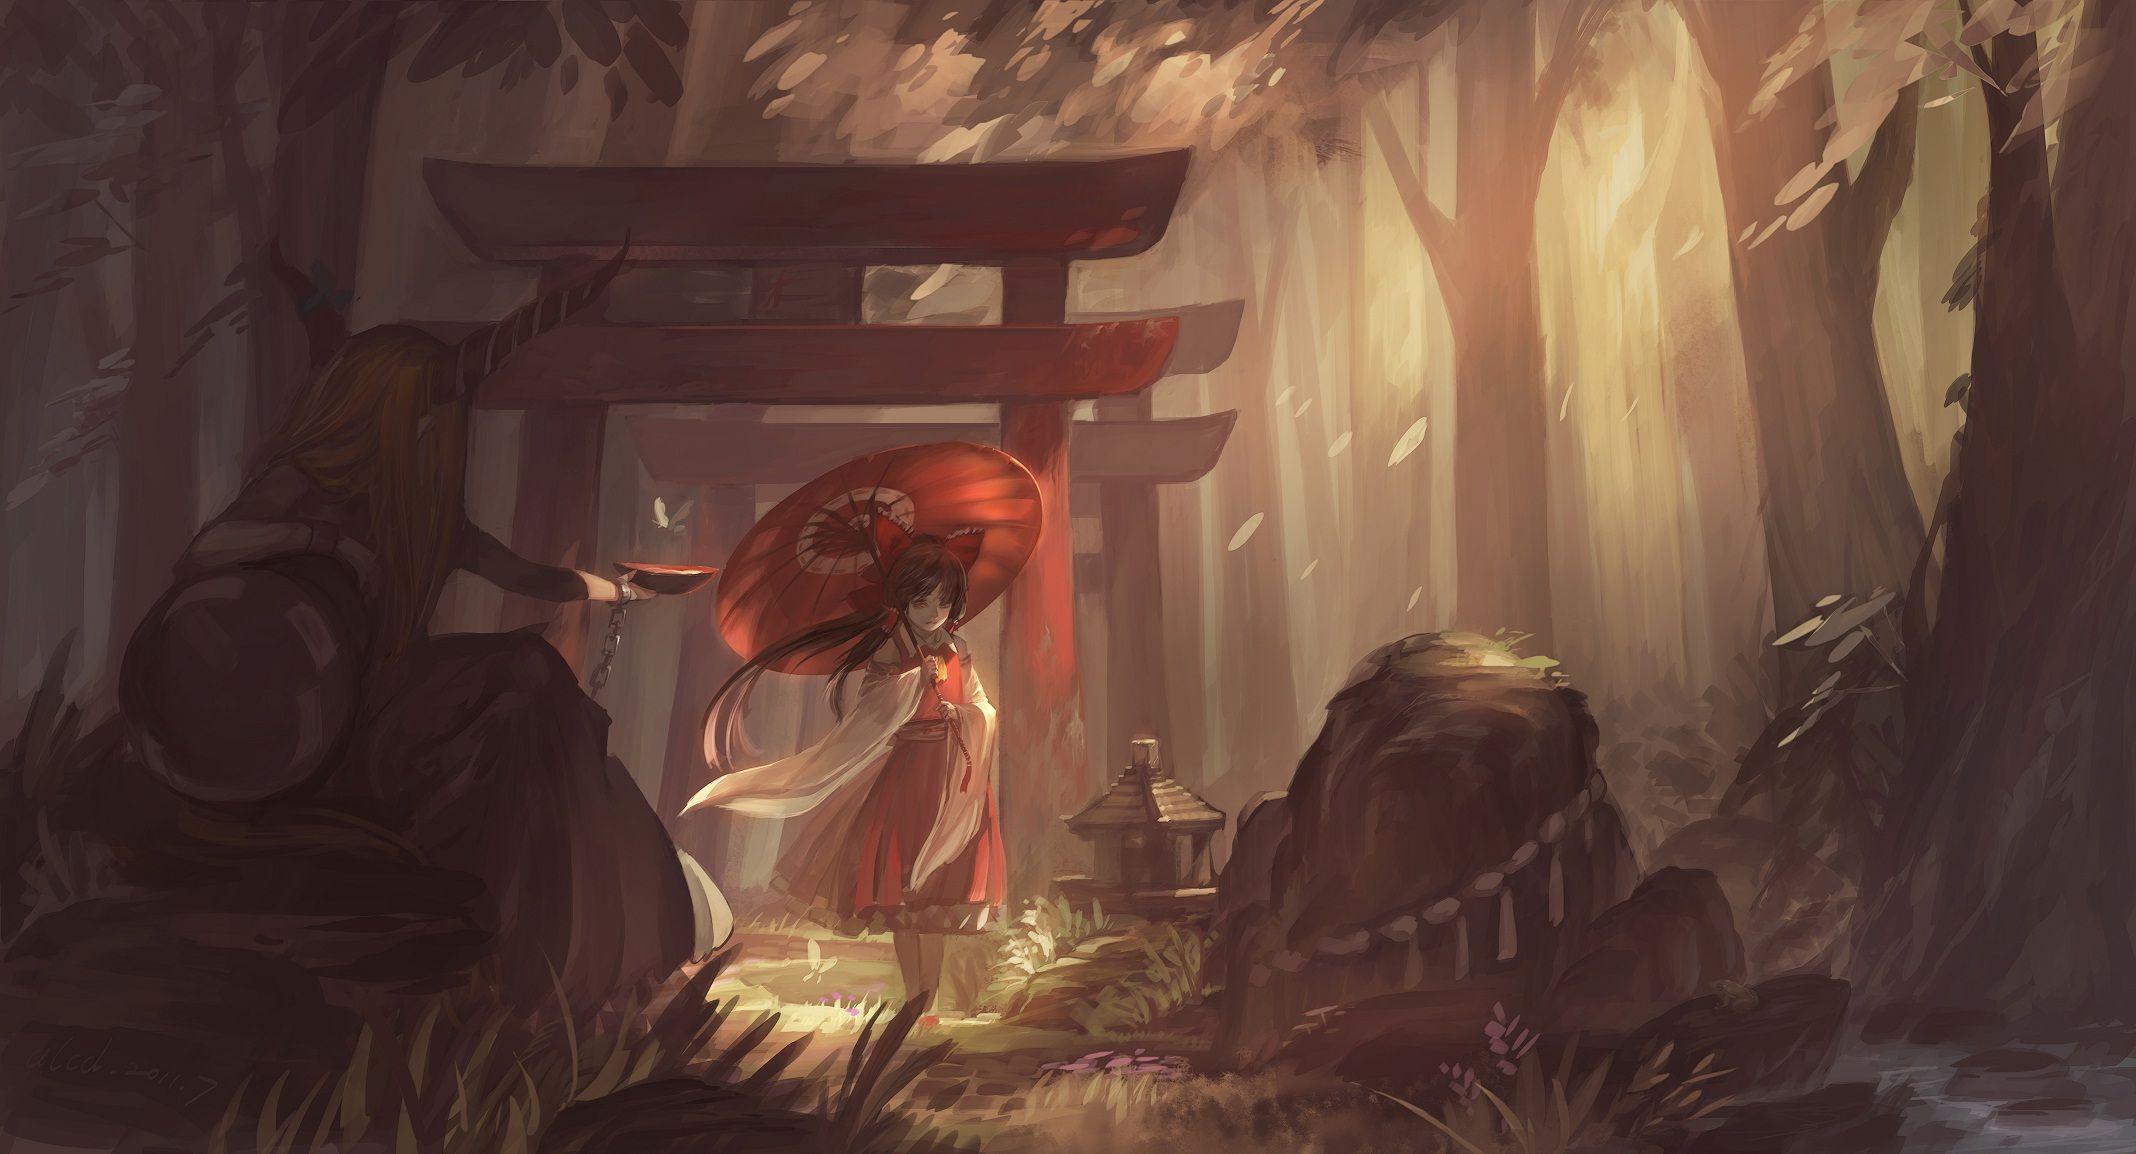 brujas viejas anime - Buscar con Google